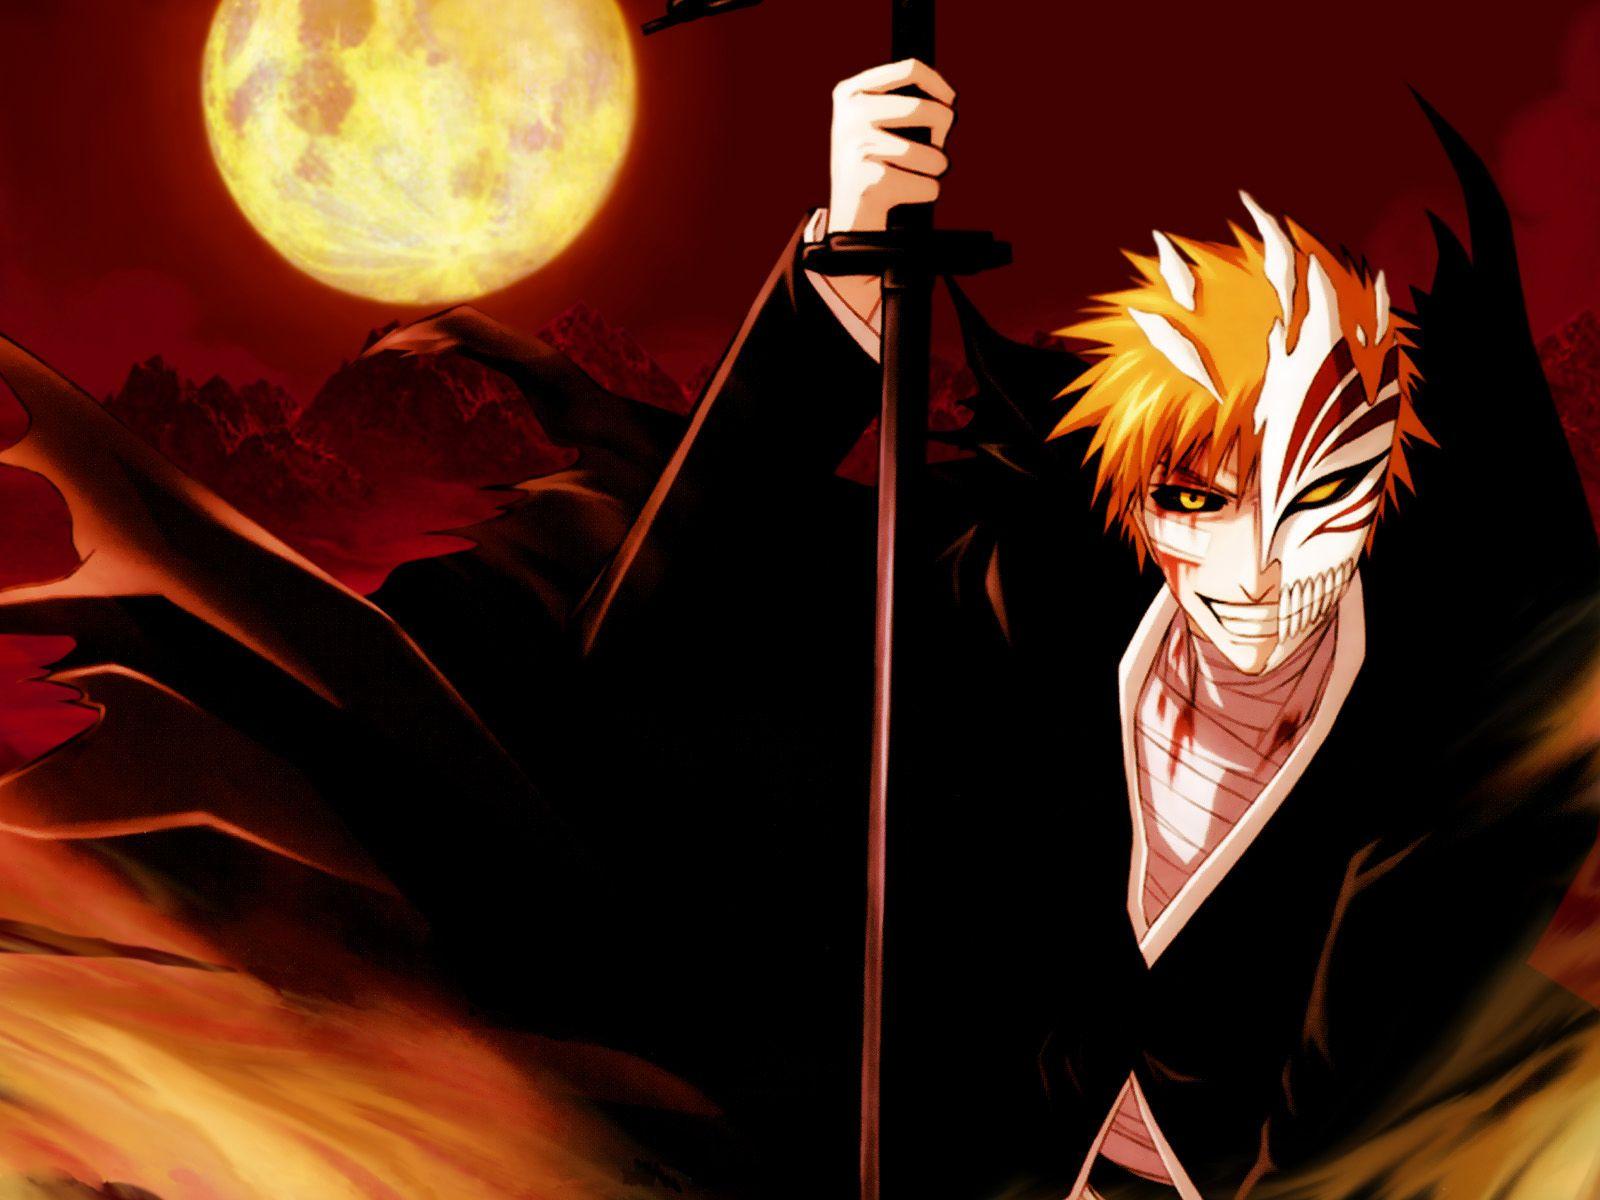 Hollow Ichigo Bleach Anime Bleach Episodes Top 10 Best Anime